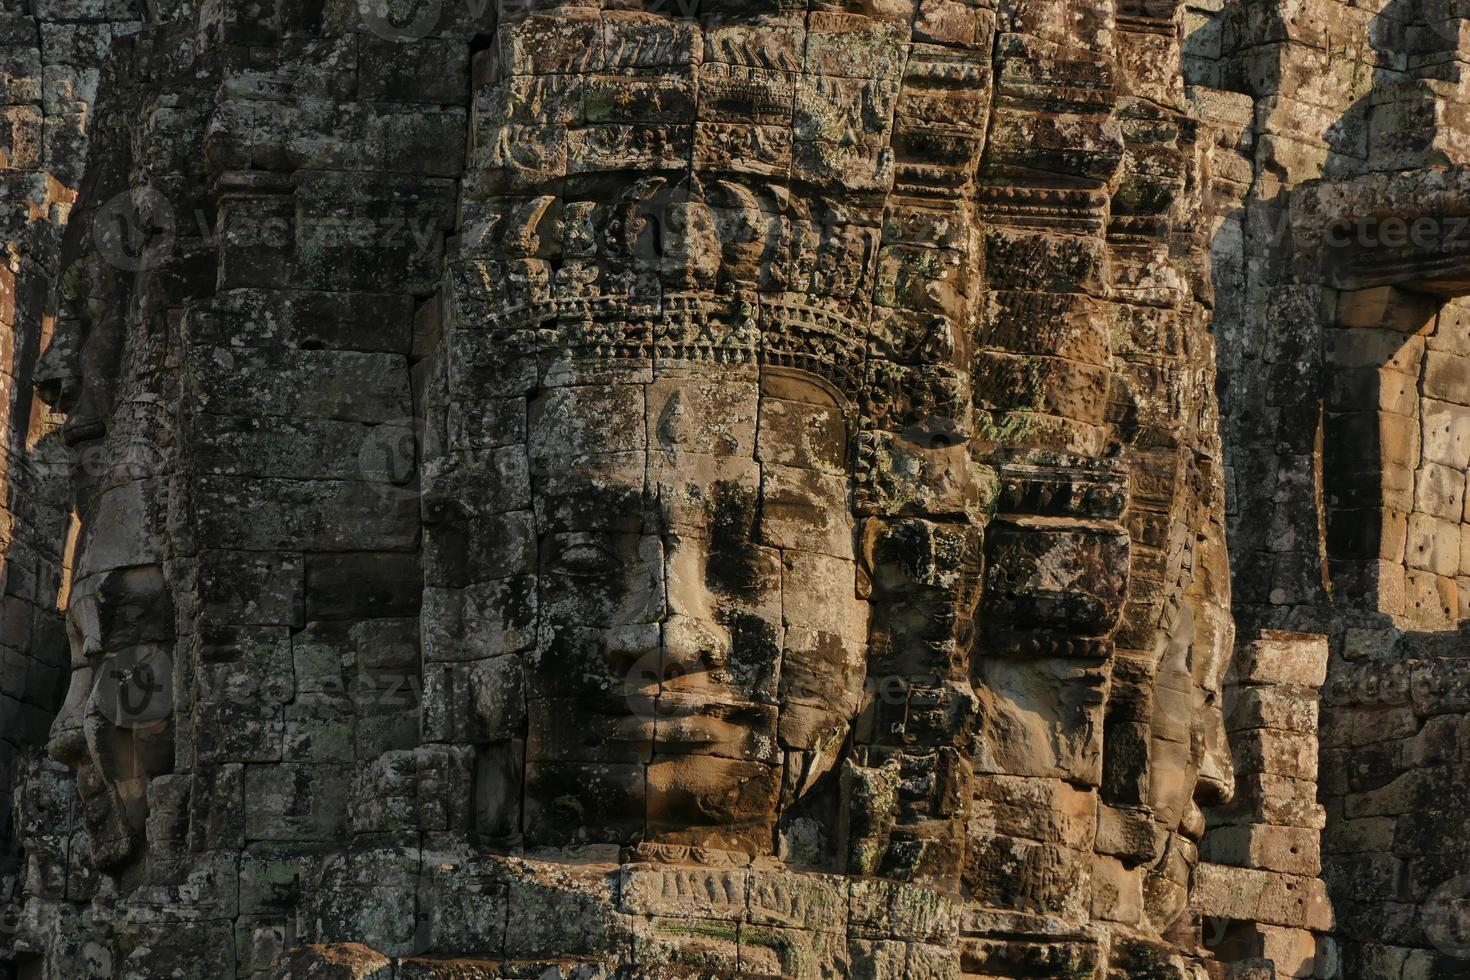 Bayon Temple di Angkor Thom in Cambogia foto